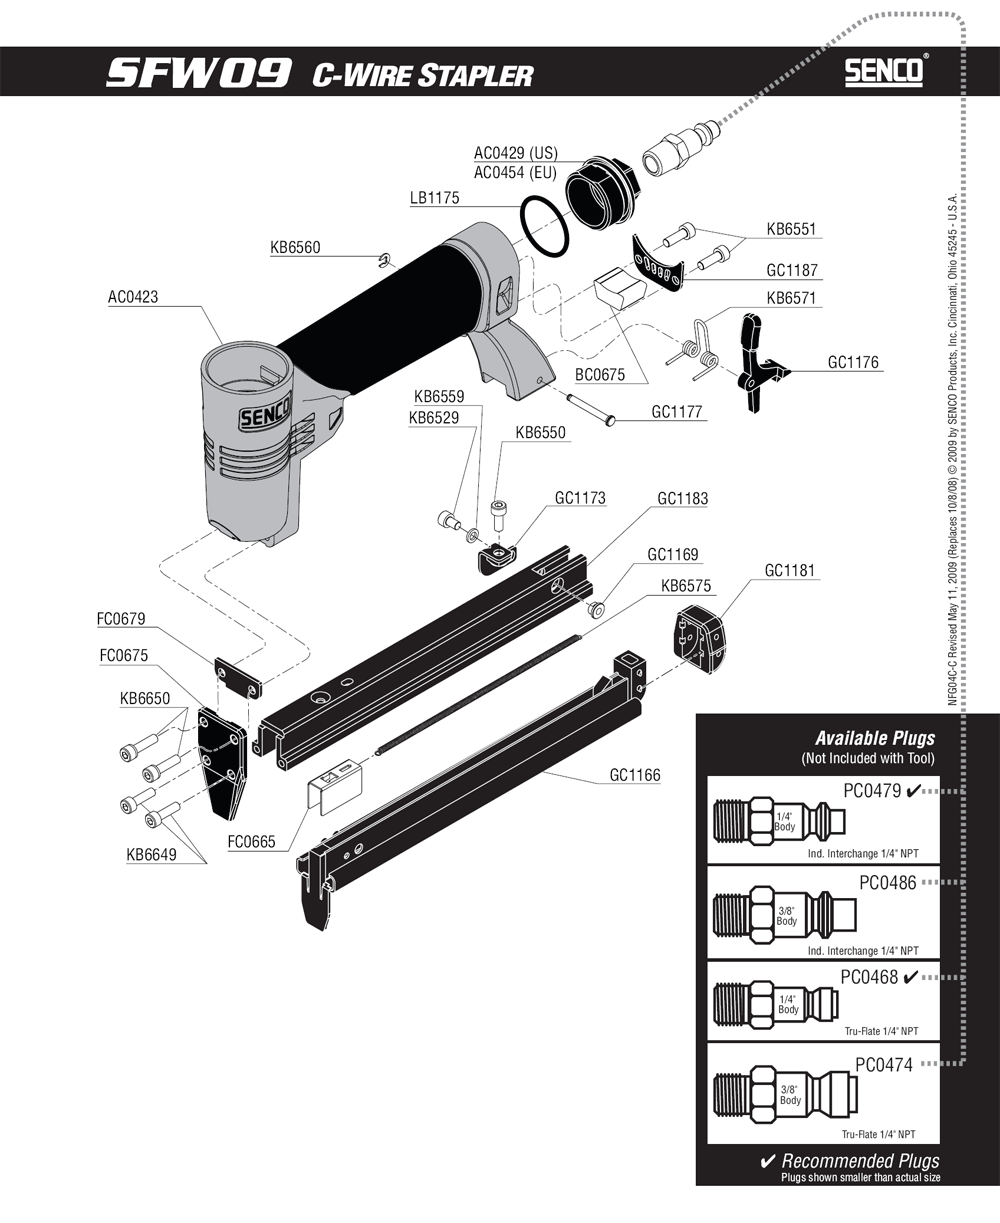 4C0061N-senco-PB-1Break Down